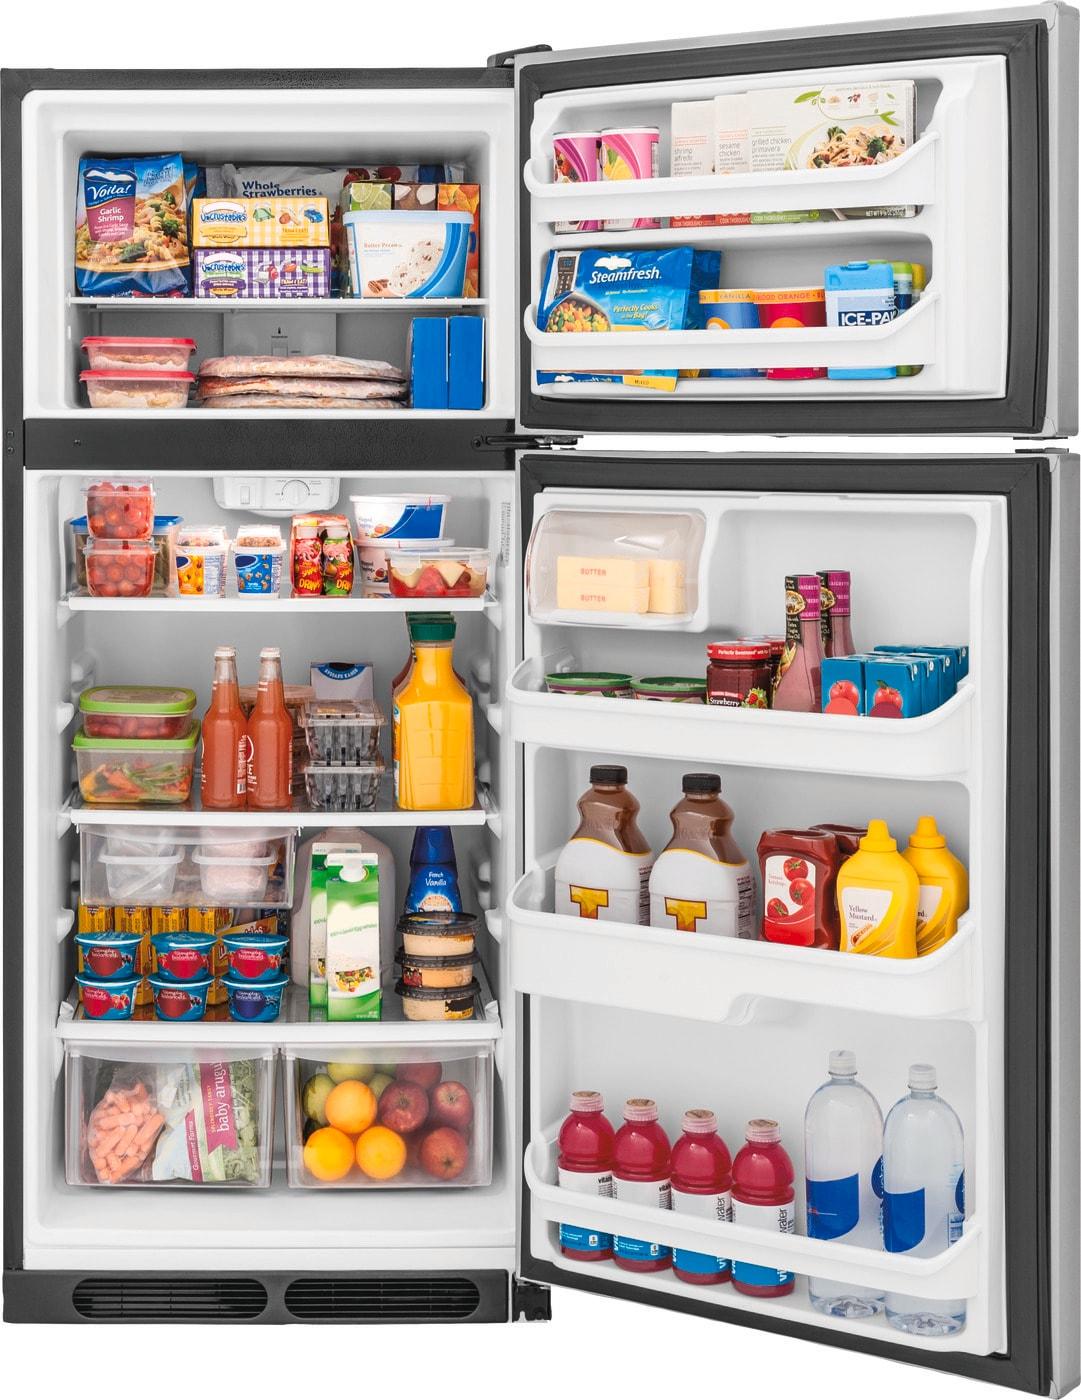 Model: FFHT1621TS   Frigidaire 16.3 Cu. Ft. Top Freezer Refrigerator